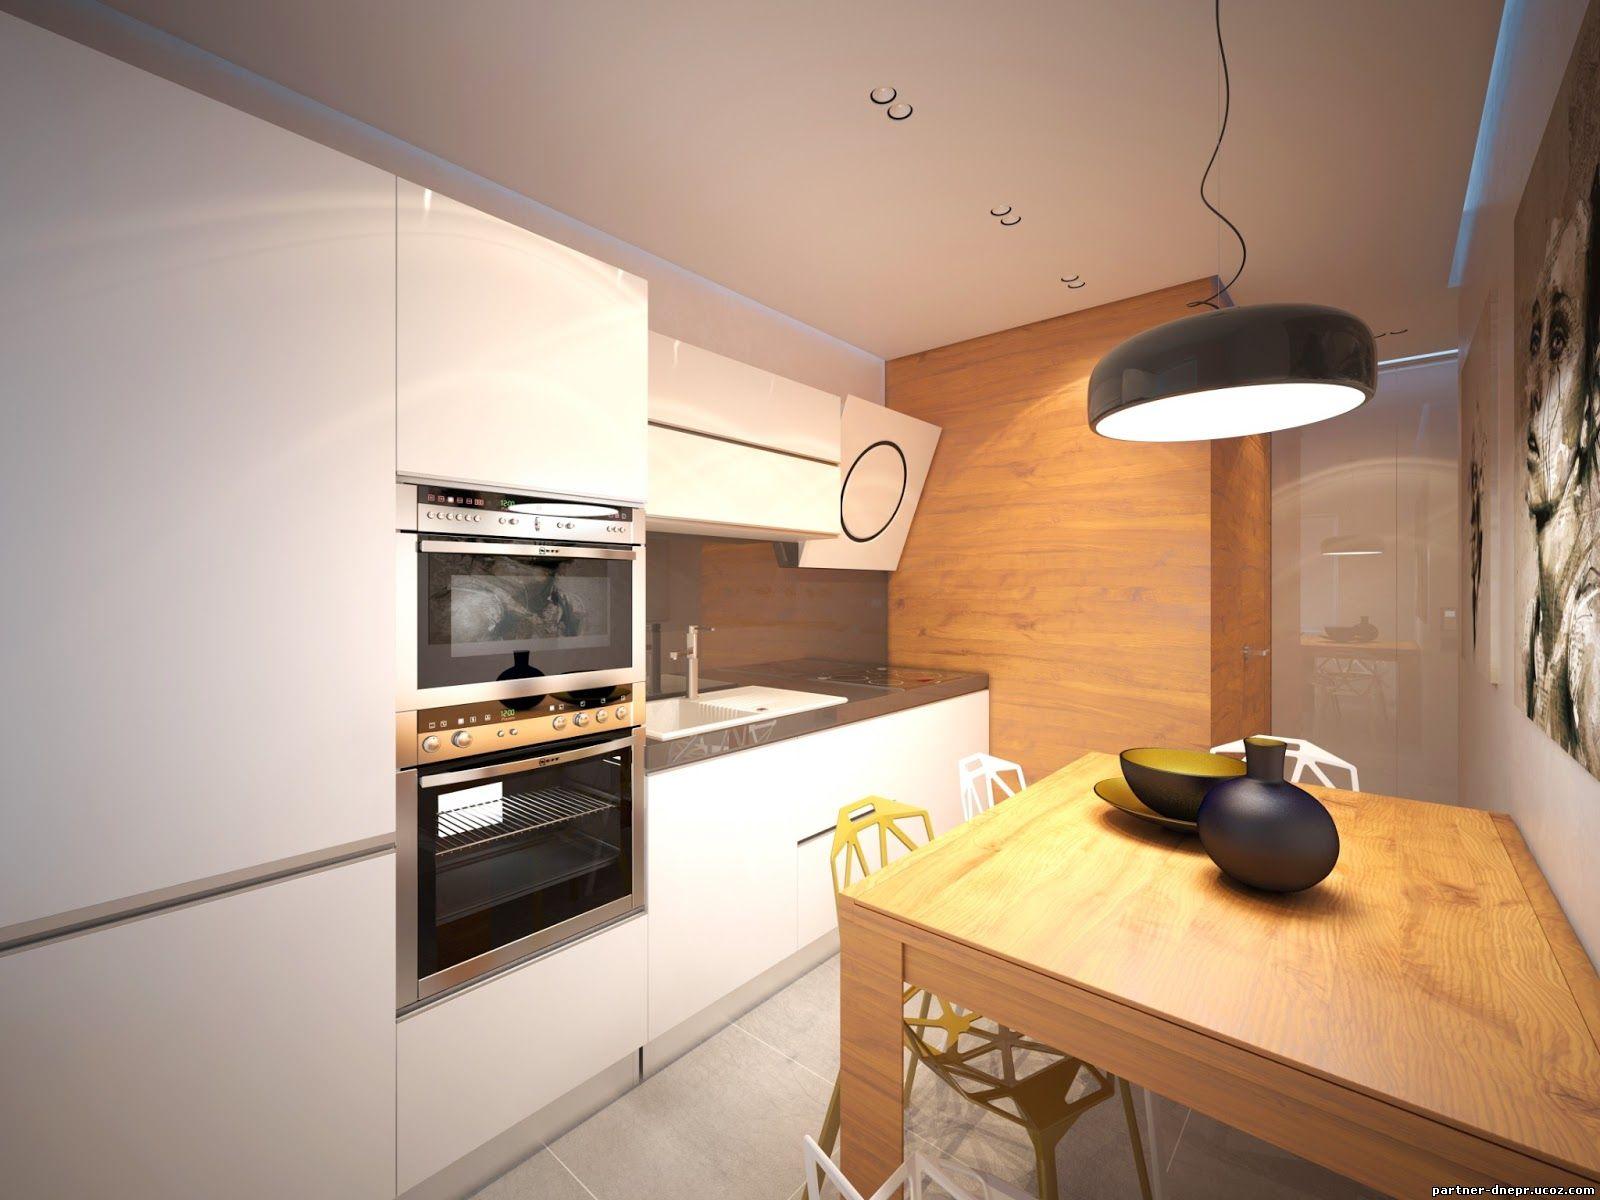 Расстановка мебели на кухне в малогабаритной квартире